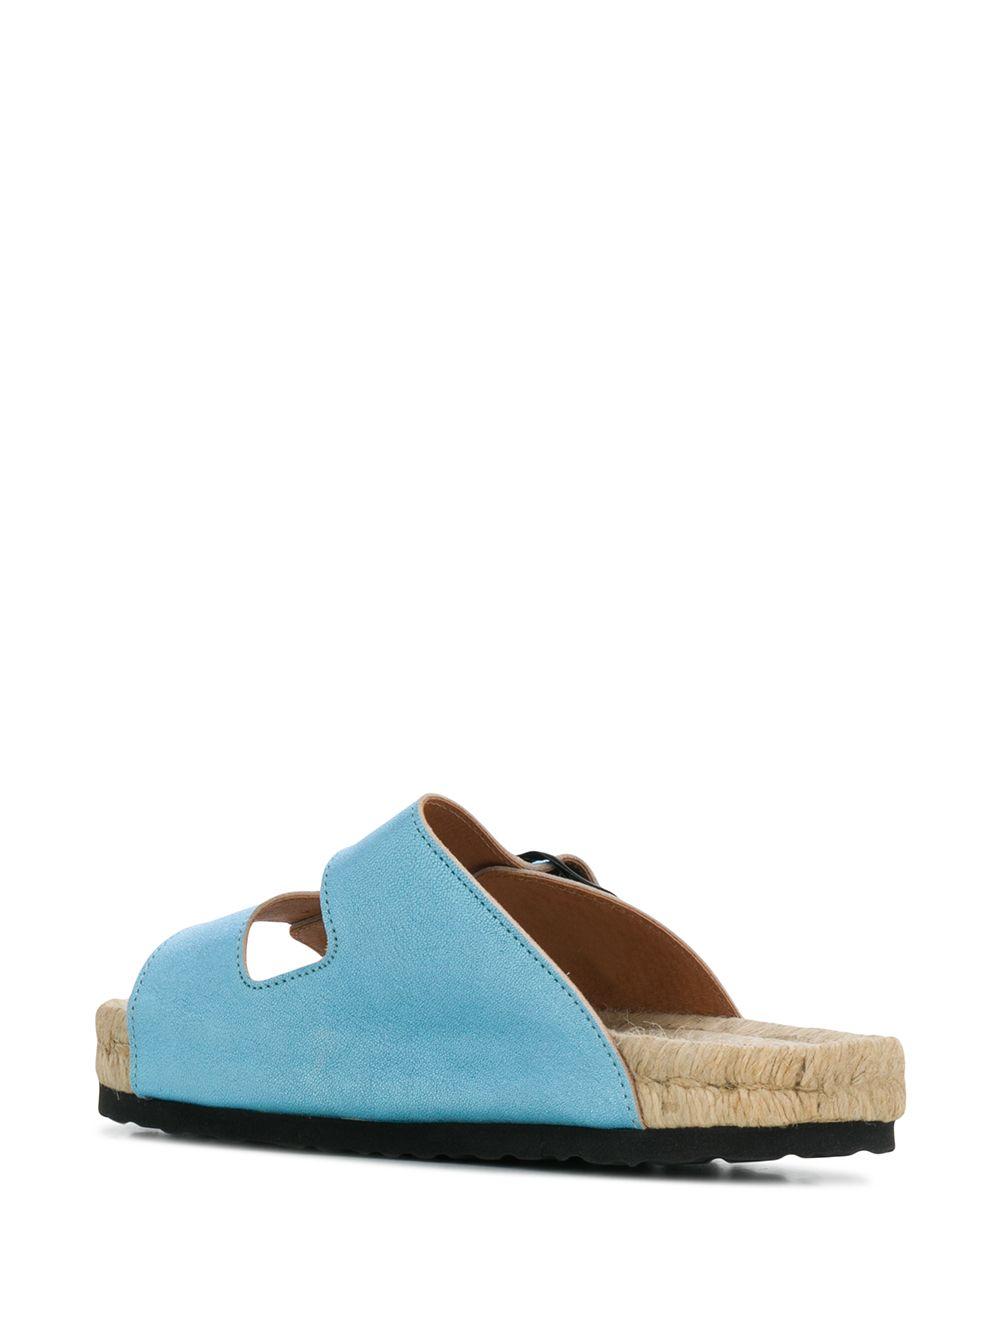 Nordic Sandals in natural jute and metallic sky blue suede  MANEBI'      O 1.5 R0CELESTE